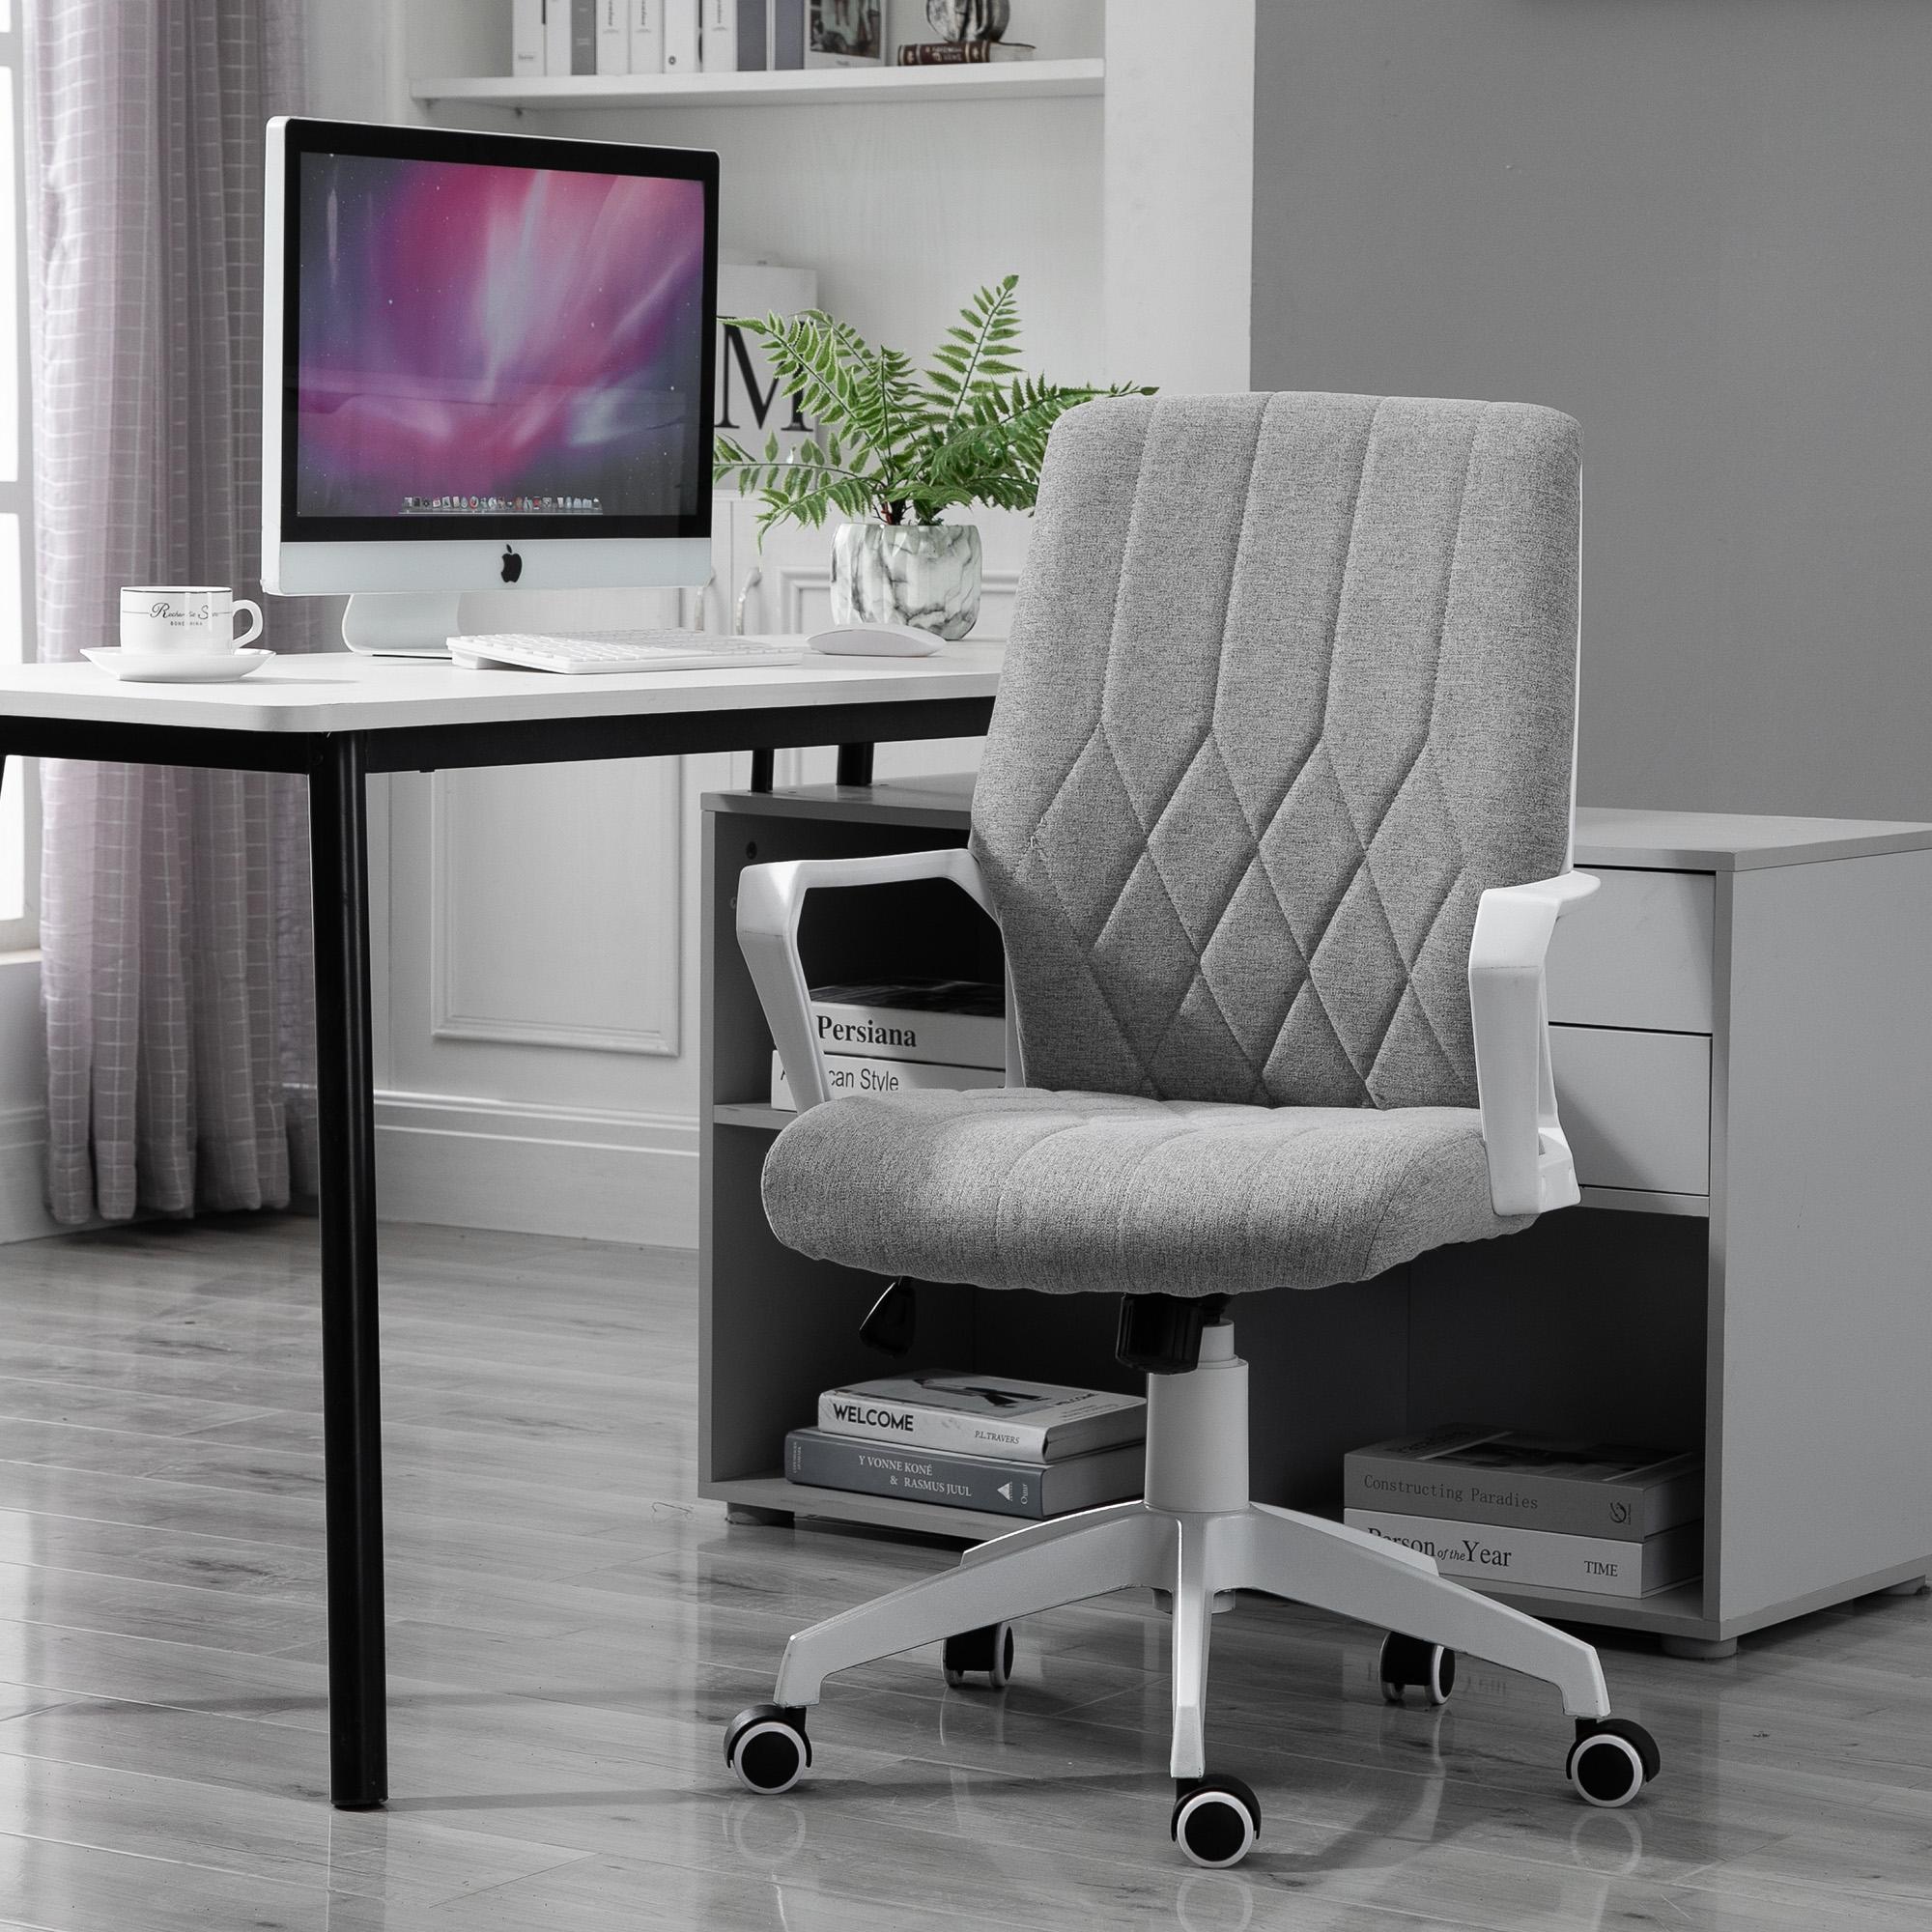 Vinsetto Ergonomic Office Chair With Wheel Fabric Rocker 360 Swivel Home 842525195584 Ebay